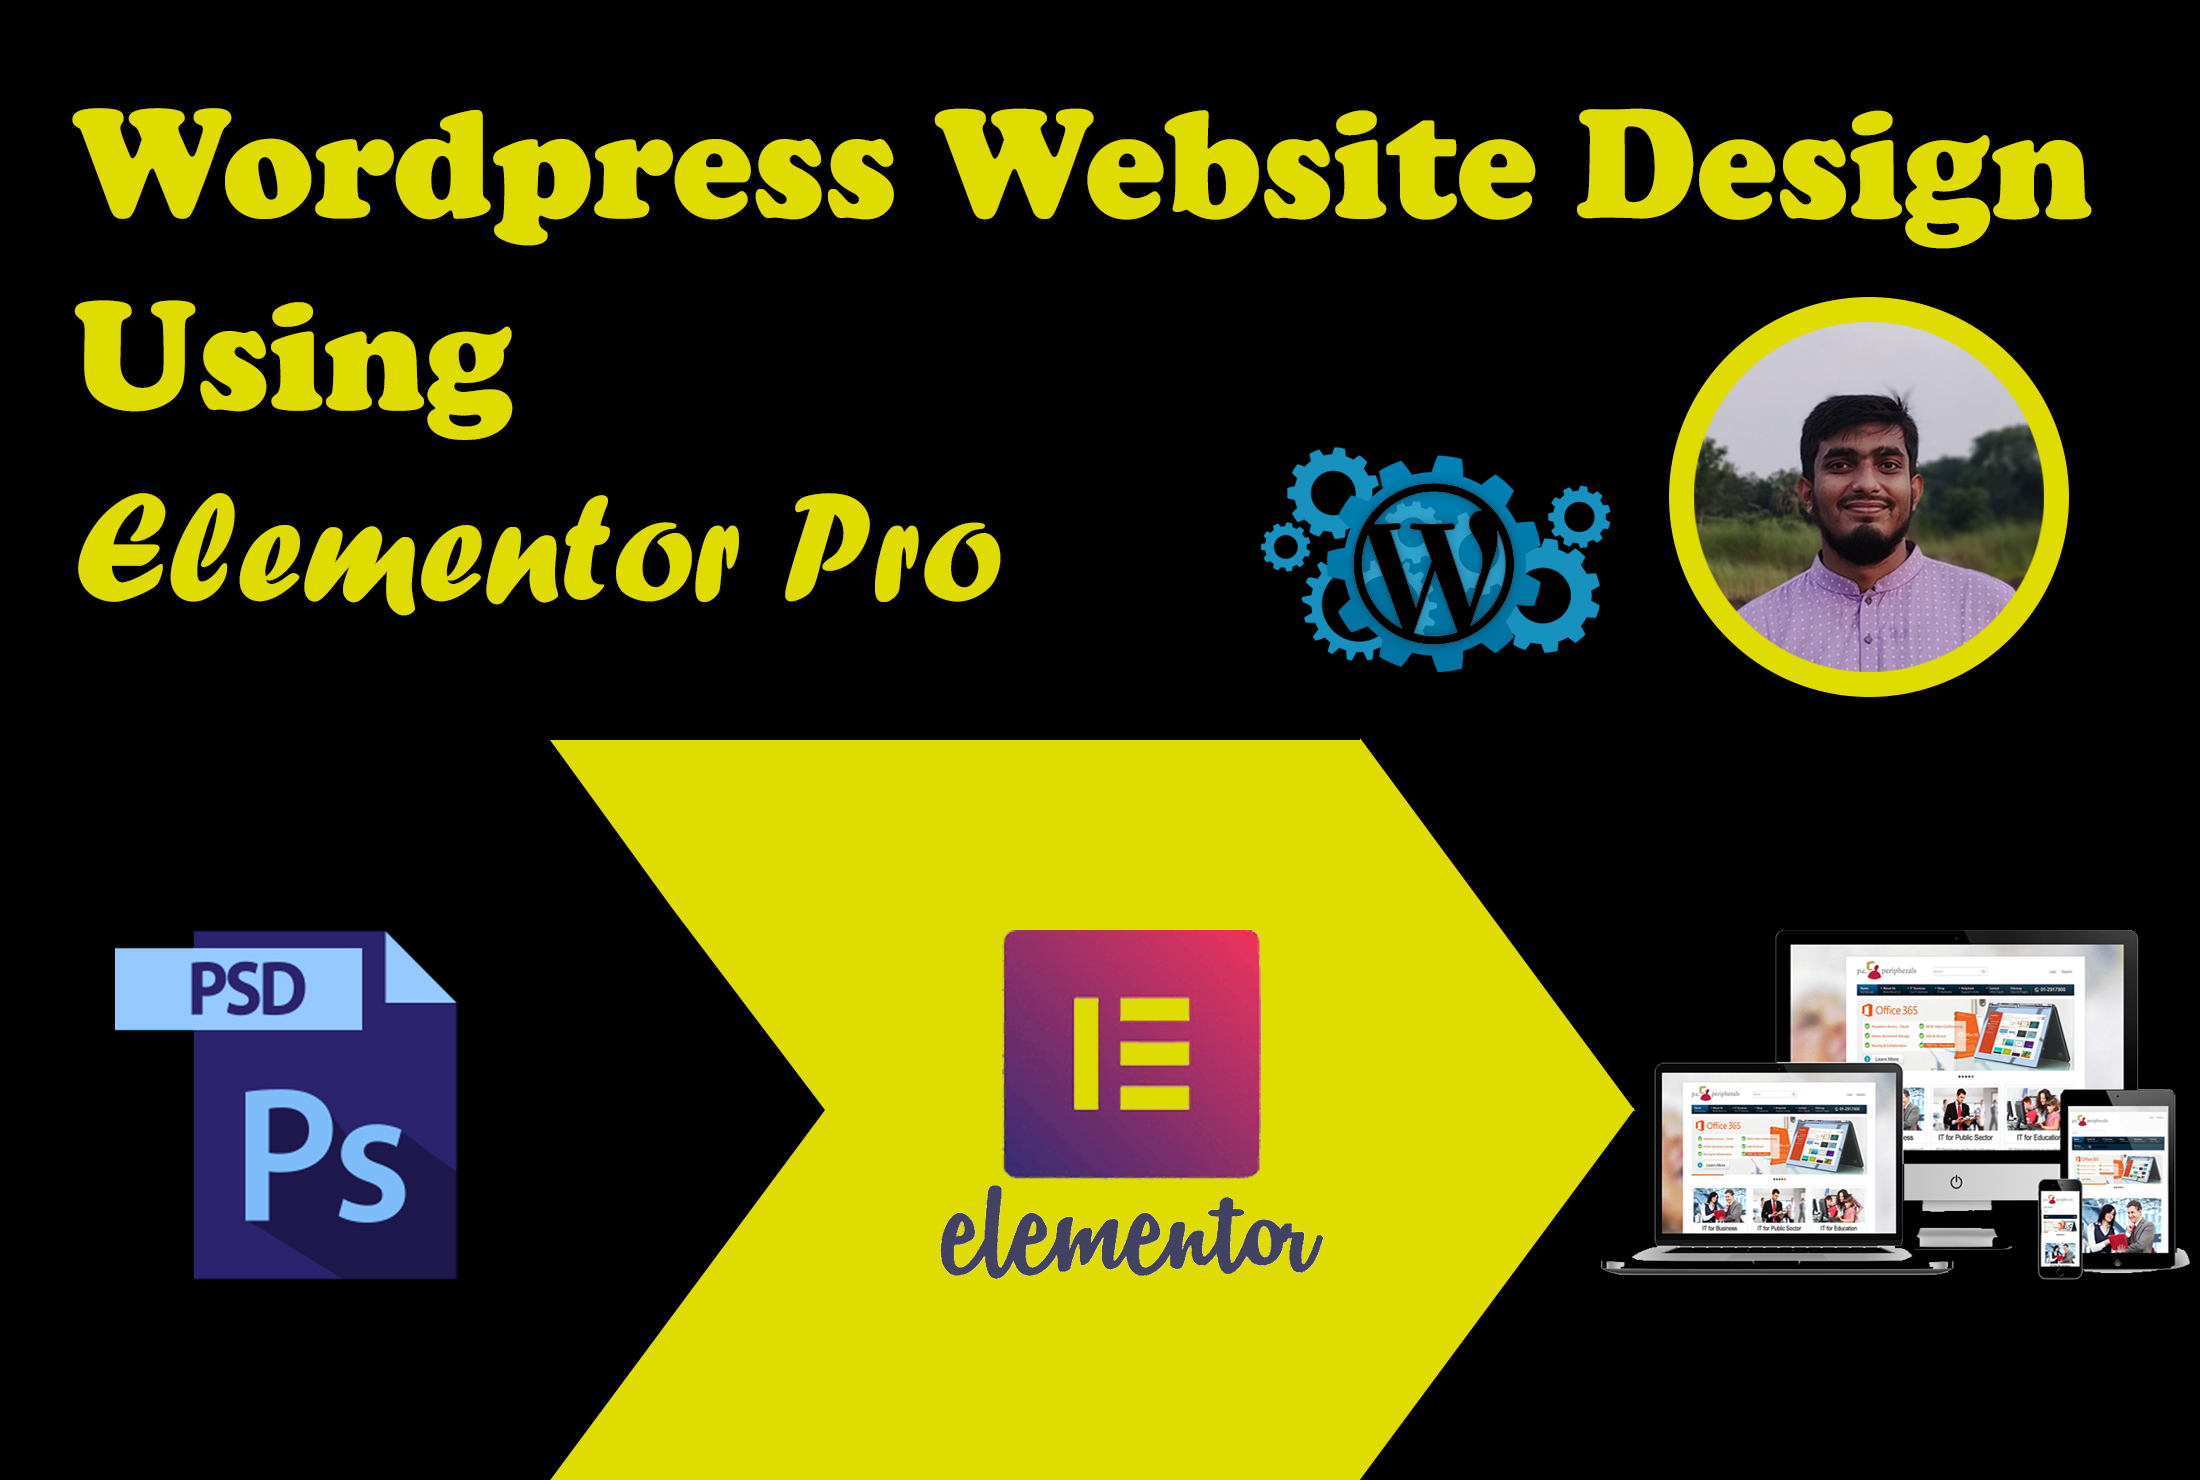 create or redesign wordpress website or landing page using elementor